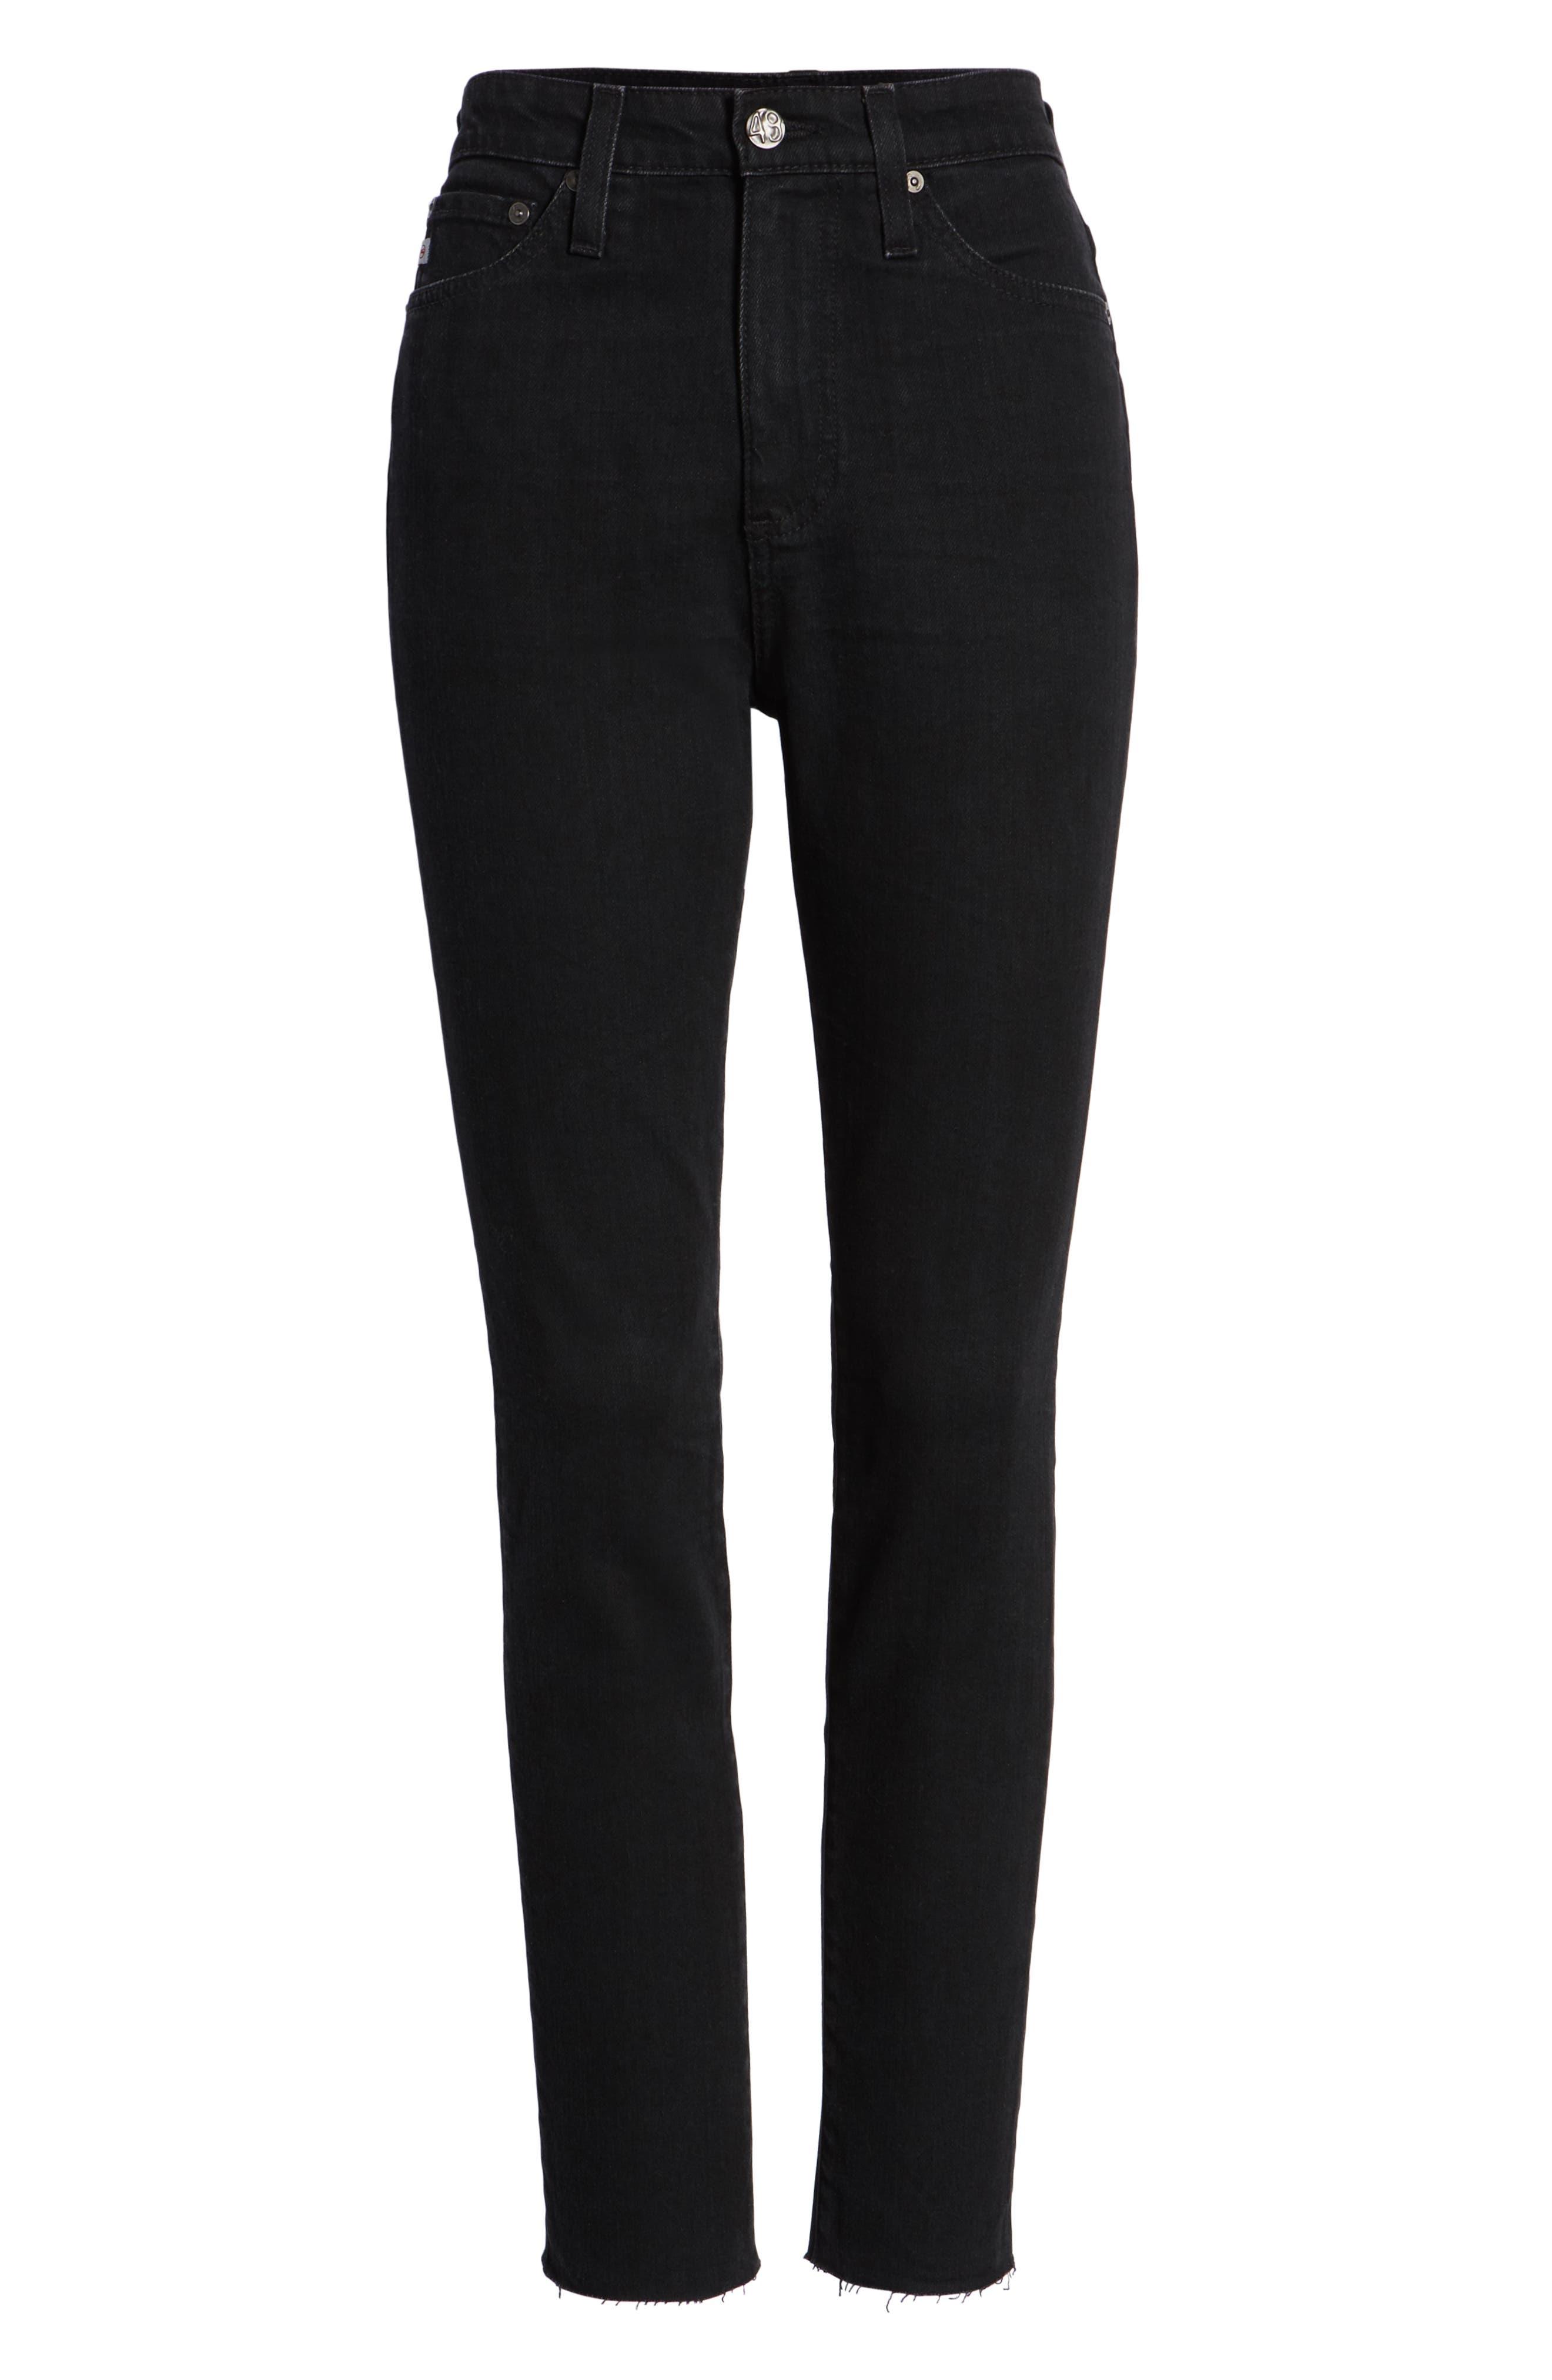 Sophia High Waist Ankle Skinny Jeans,                             Alternate thumbnail 7, color,                             1 Year Black Hawk